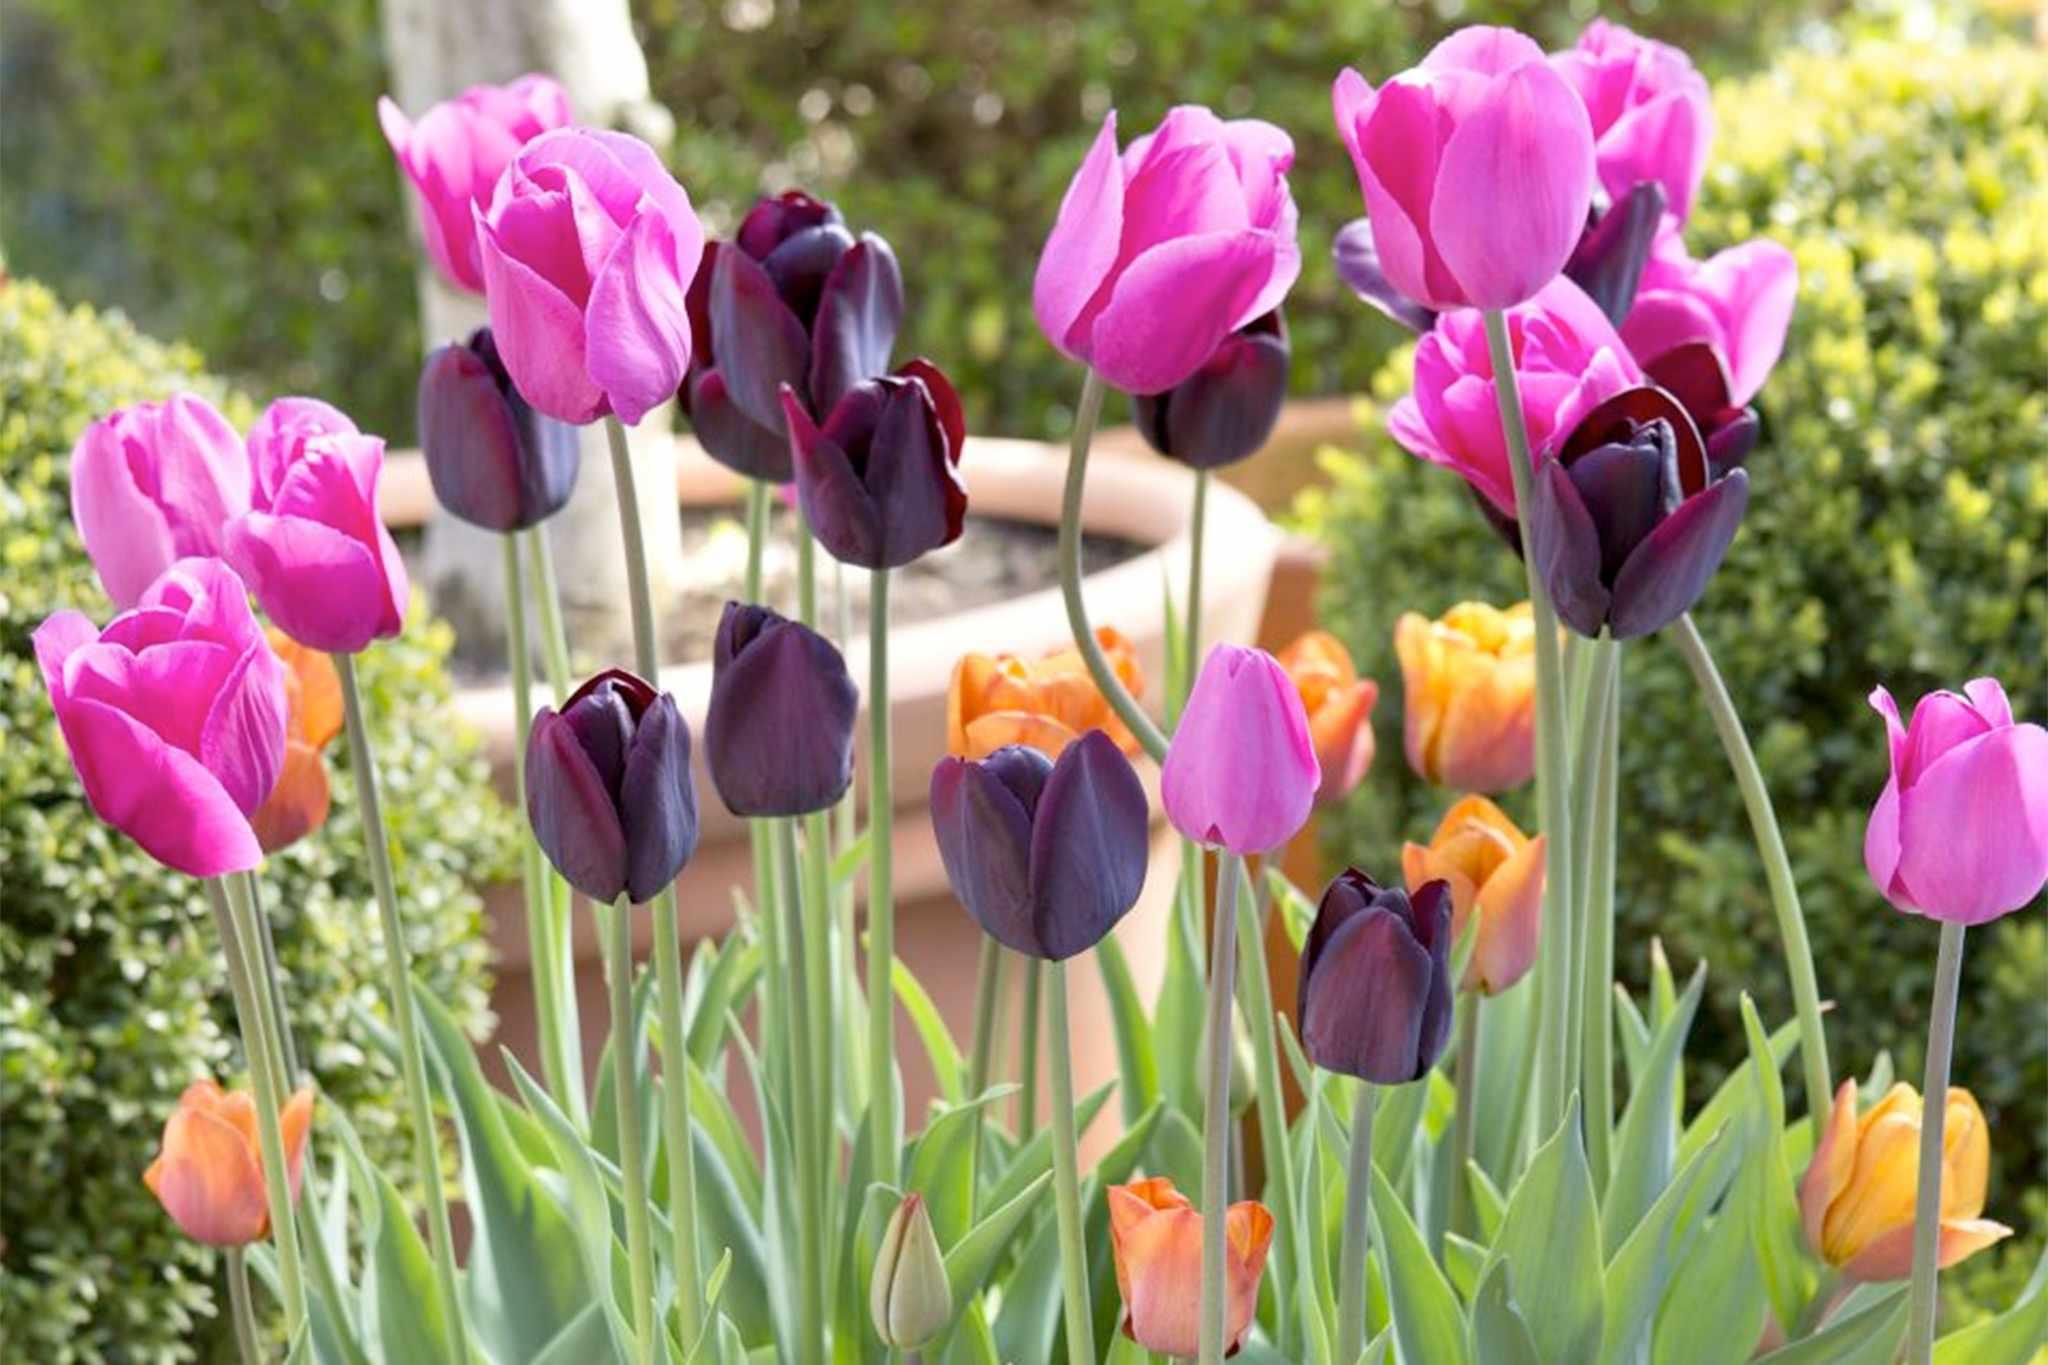 Purple, pink and orange display